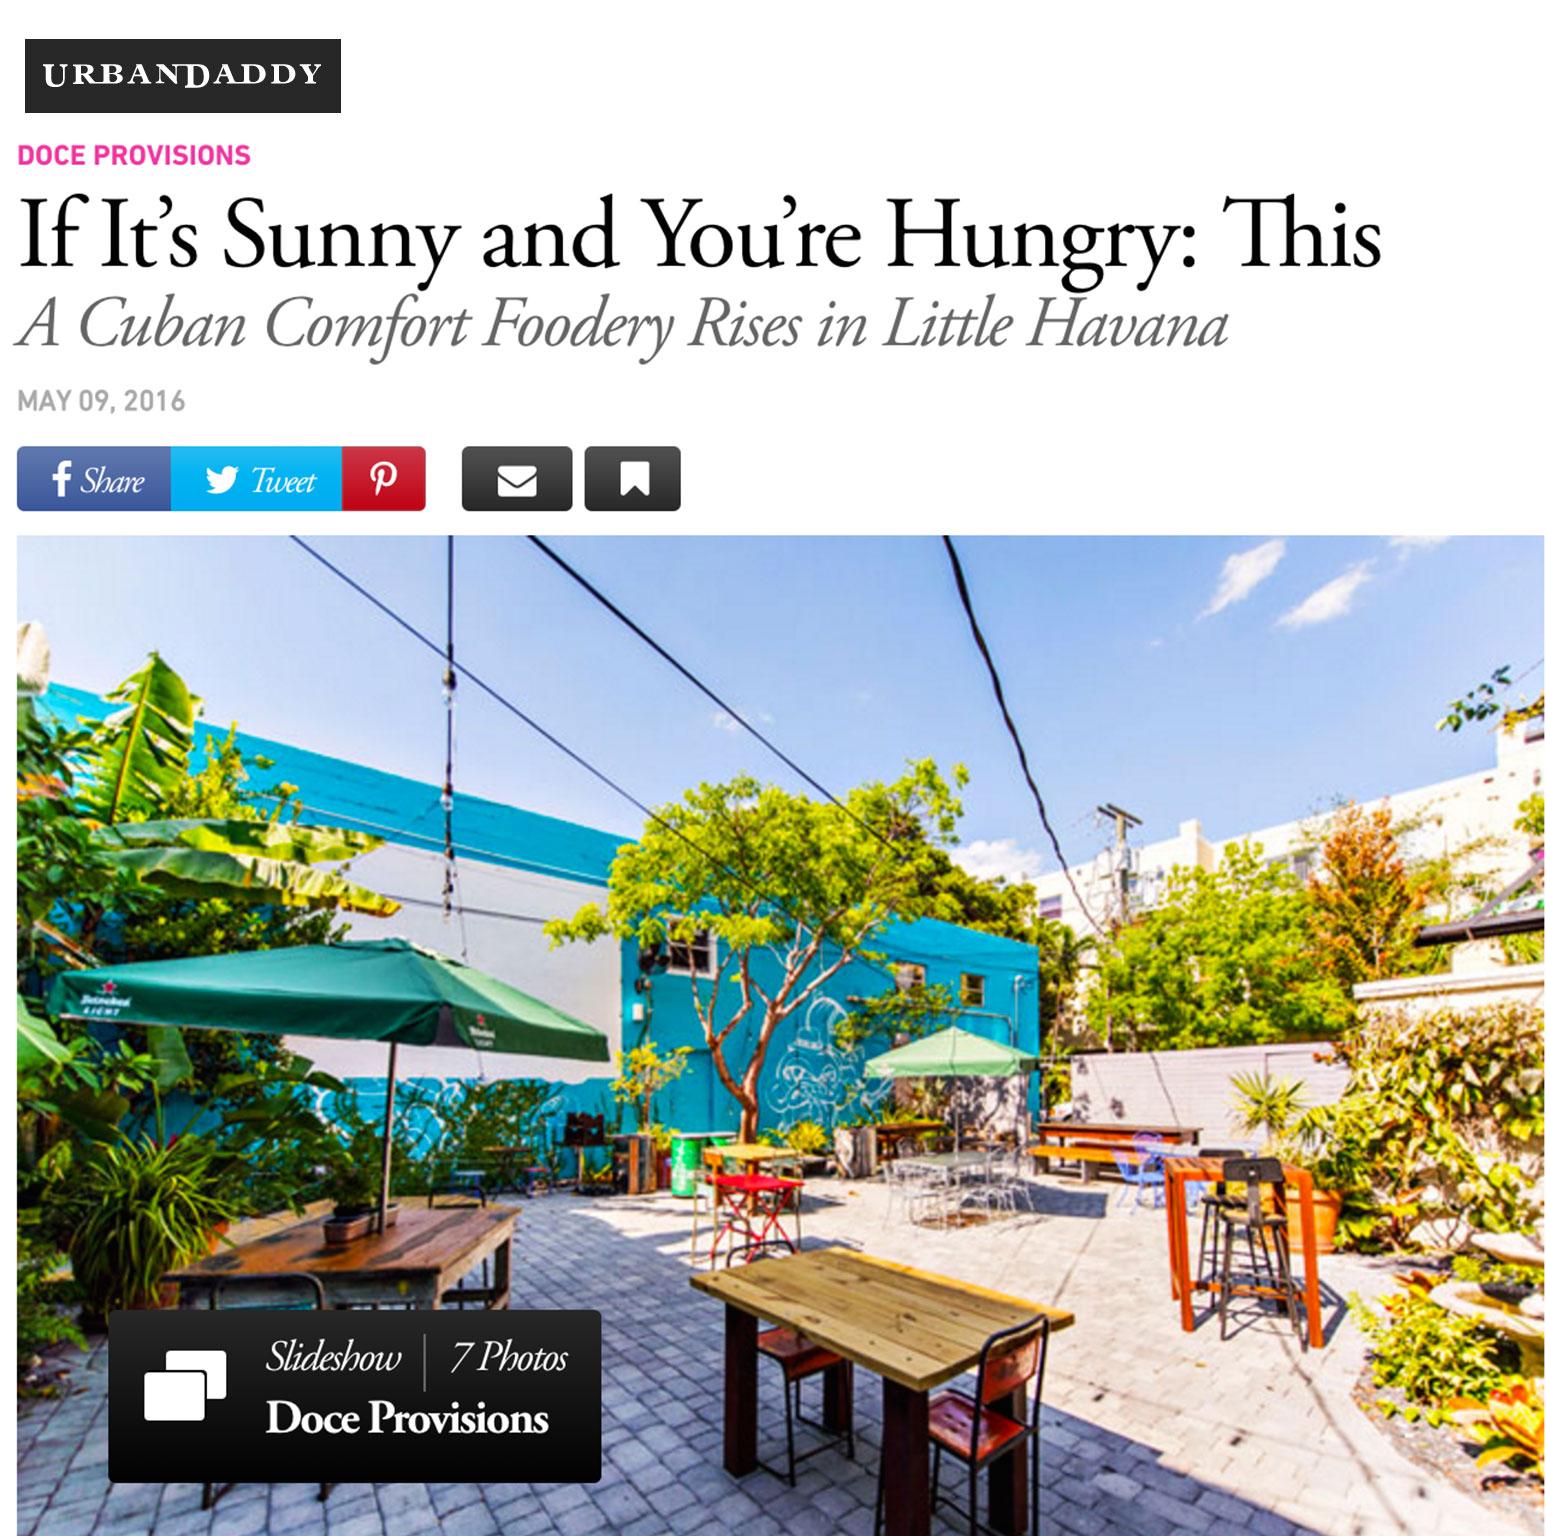 A Cuban comfort foodery rises in Little Havana ...  READ MORE